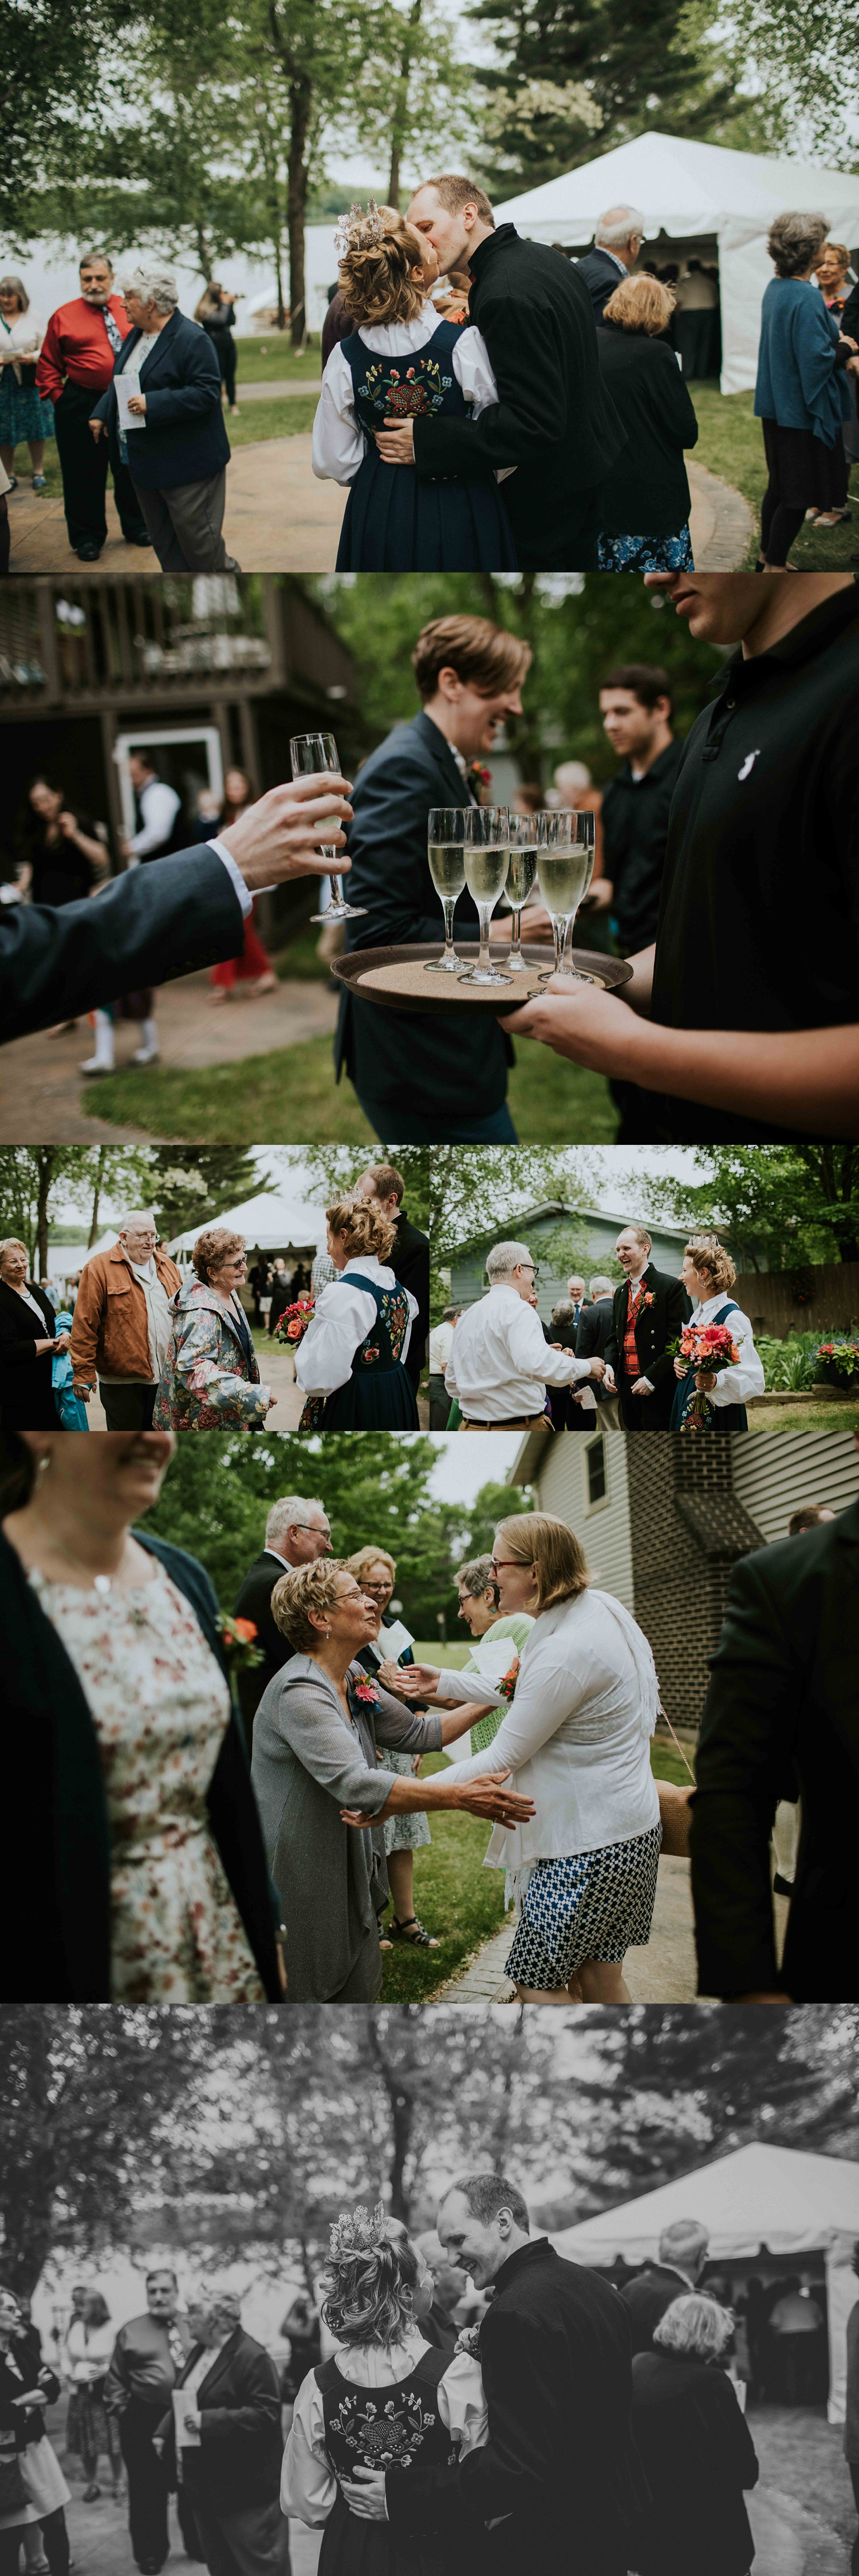 Norwegian Wedding Stevens Point Wisconsin Wedding Photographer Chloe Ann Photography_0018.jpg